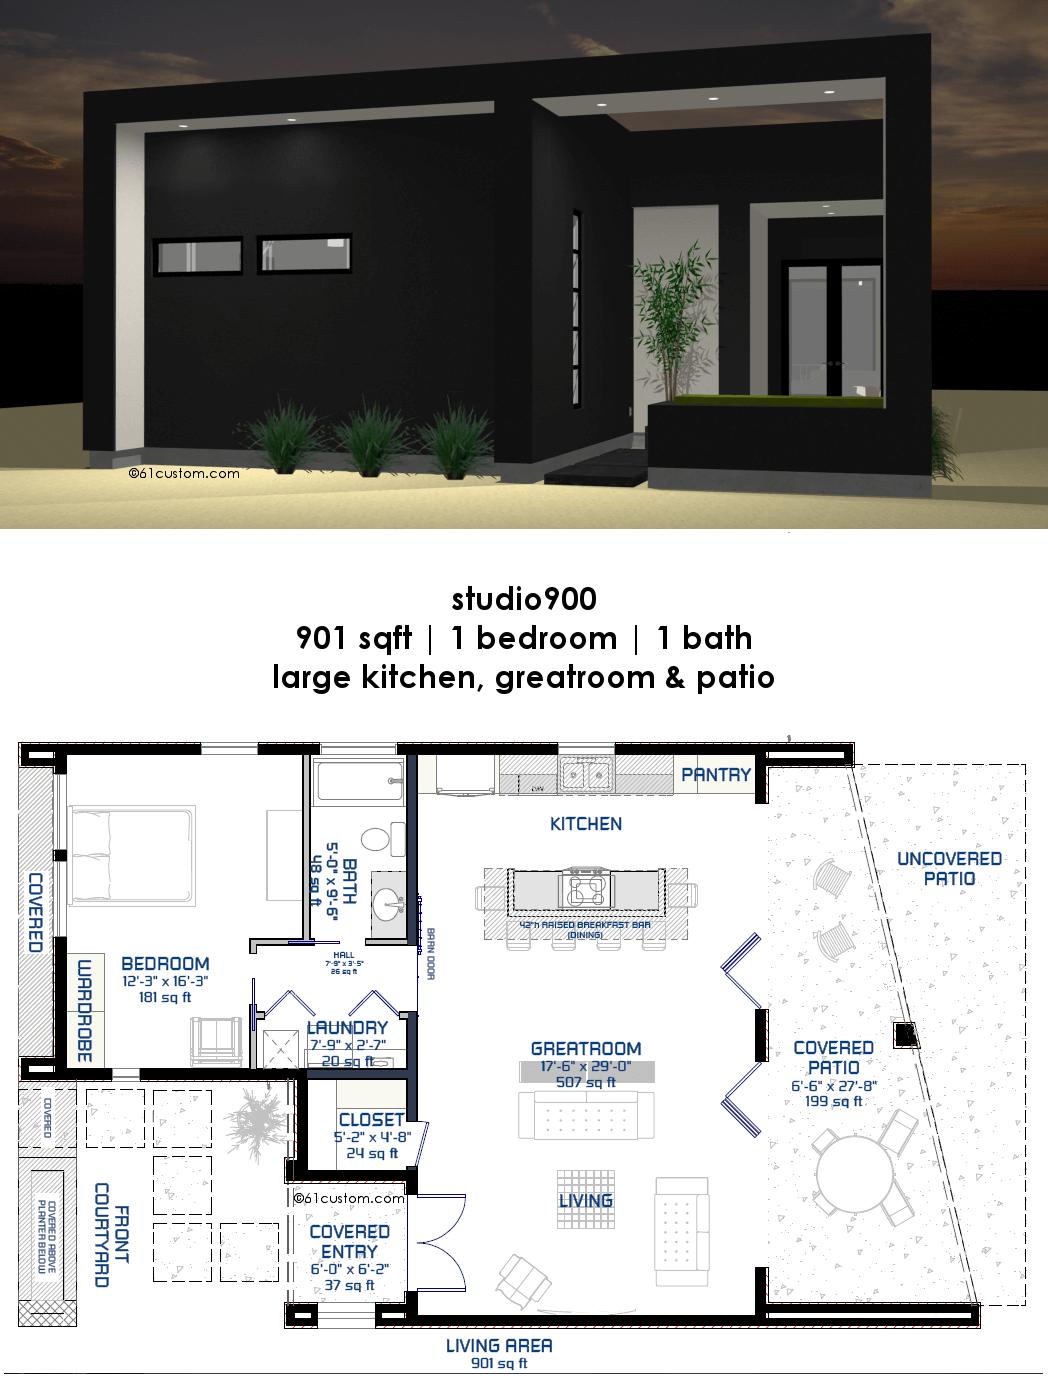 Studio900 Small Courtyard House Plan Modern House Plans